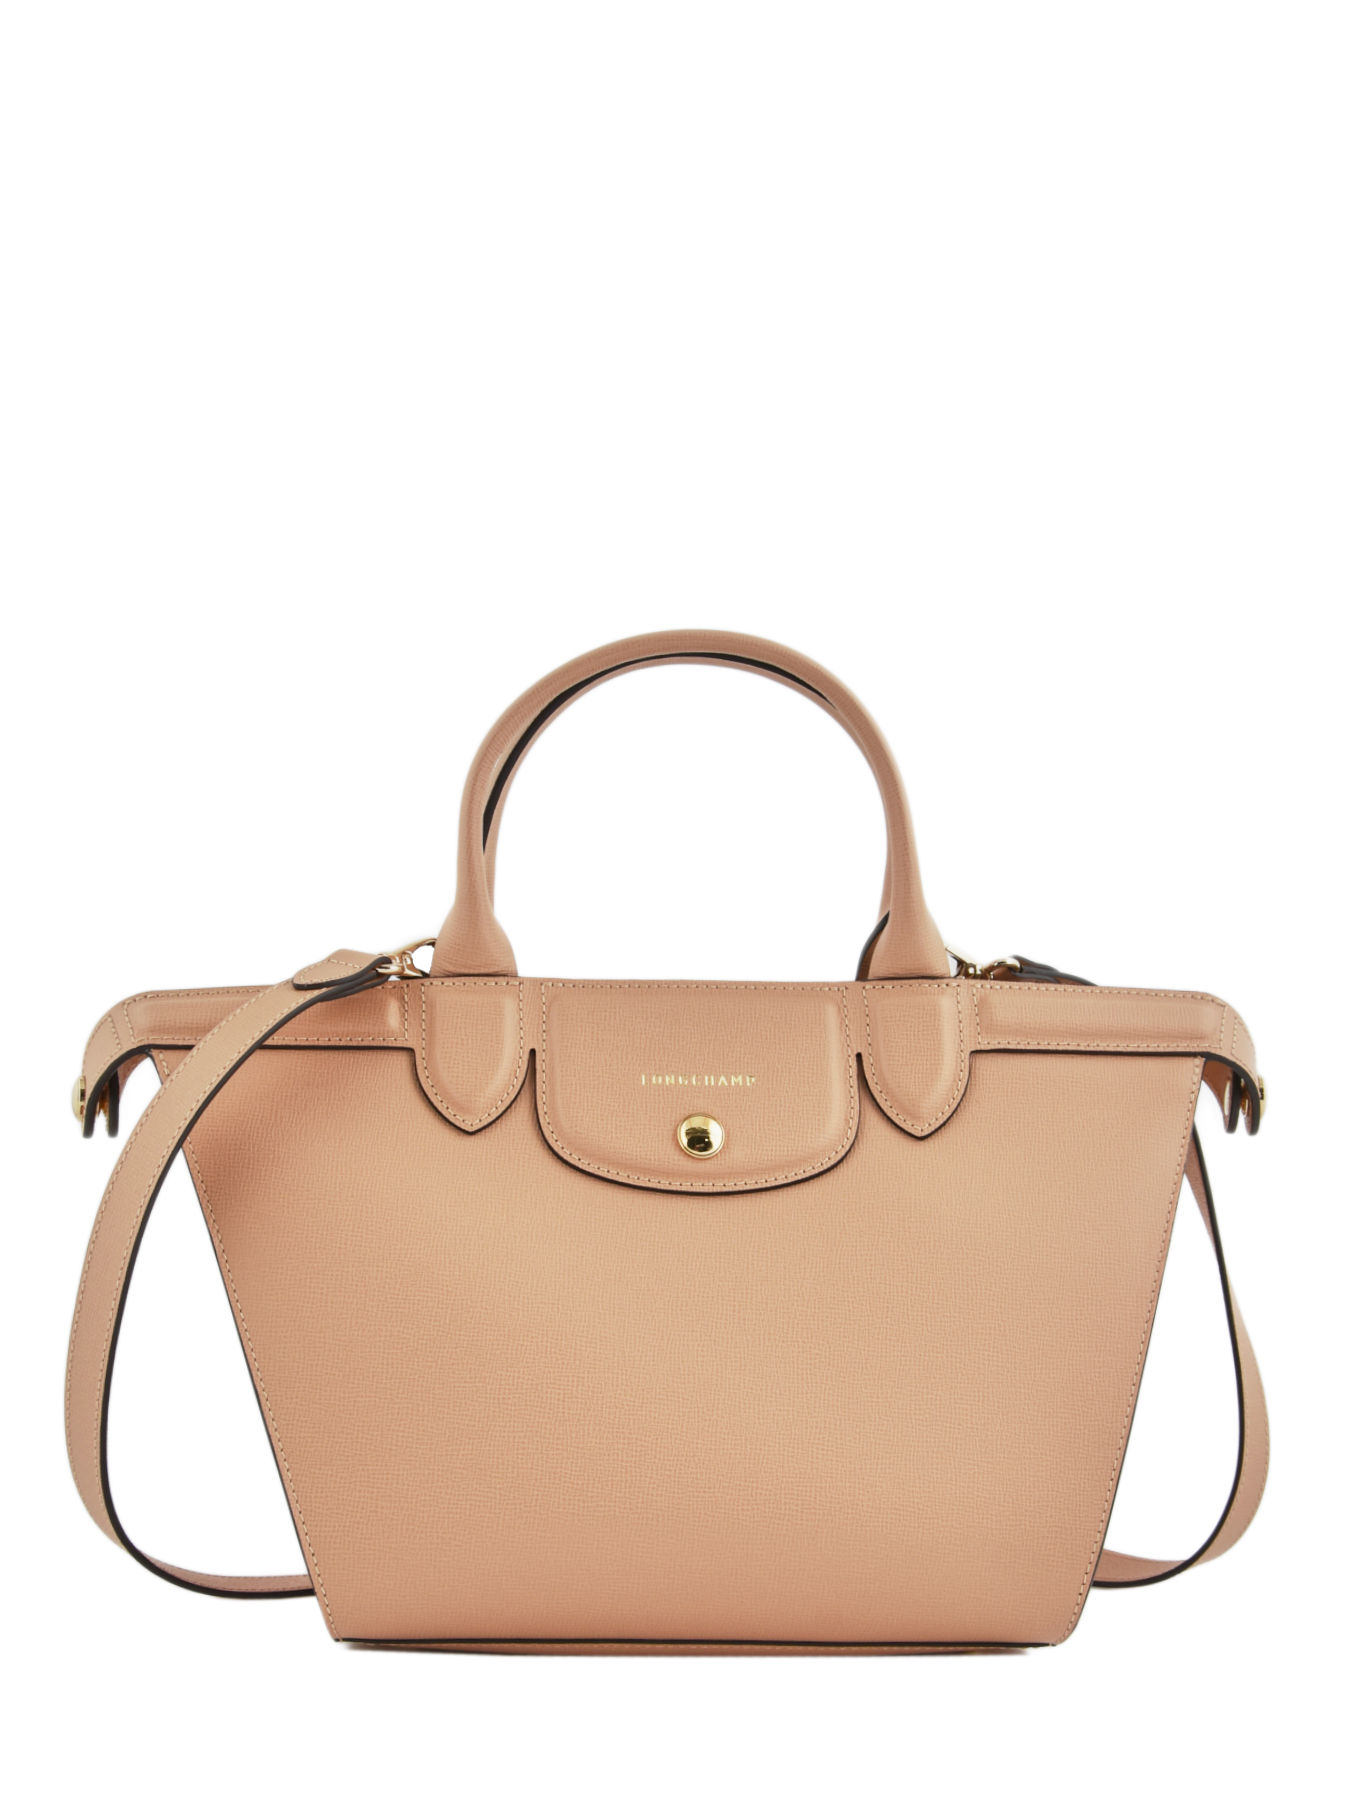 Longchamp Handbag Beige · Longchamp Handbag Beige ...